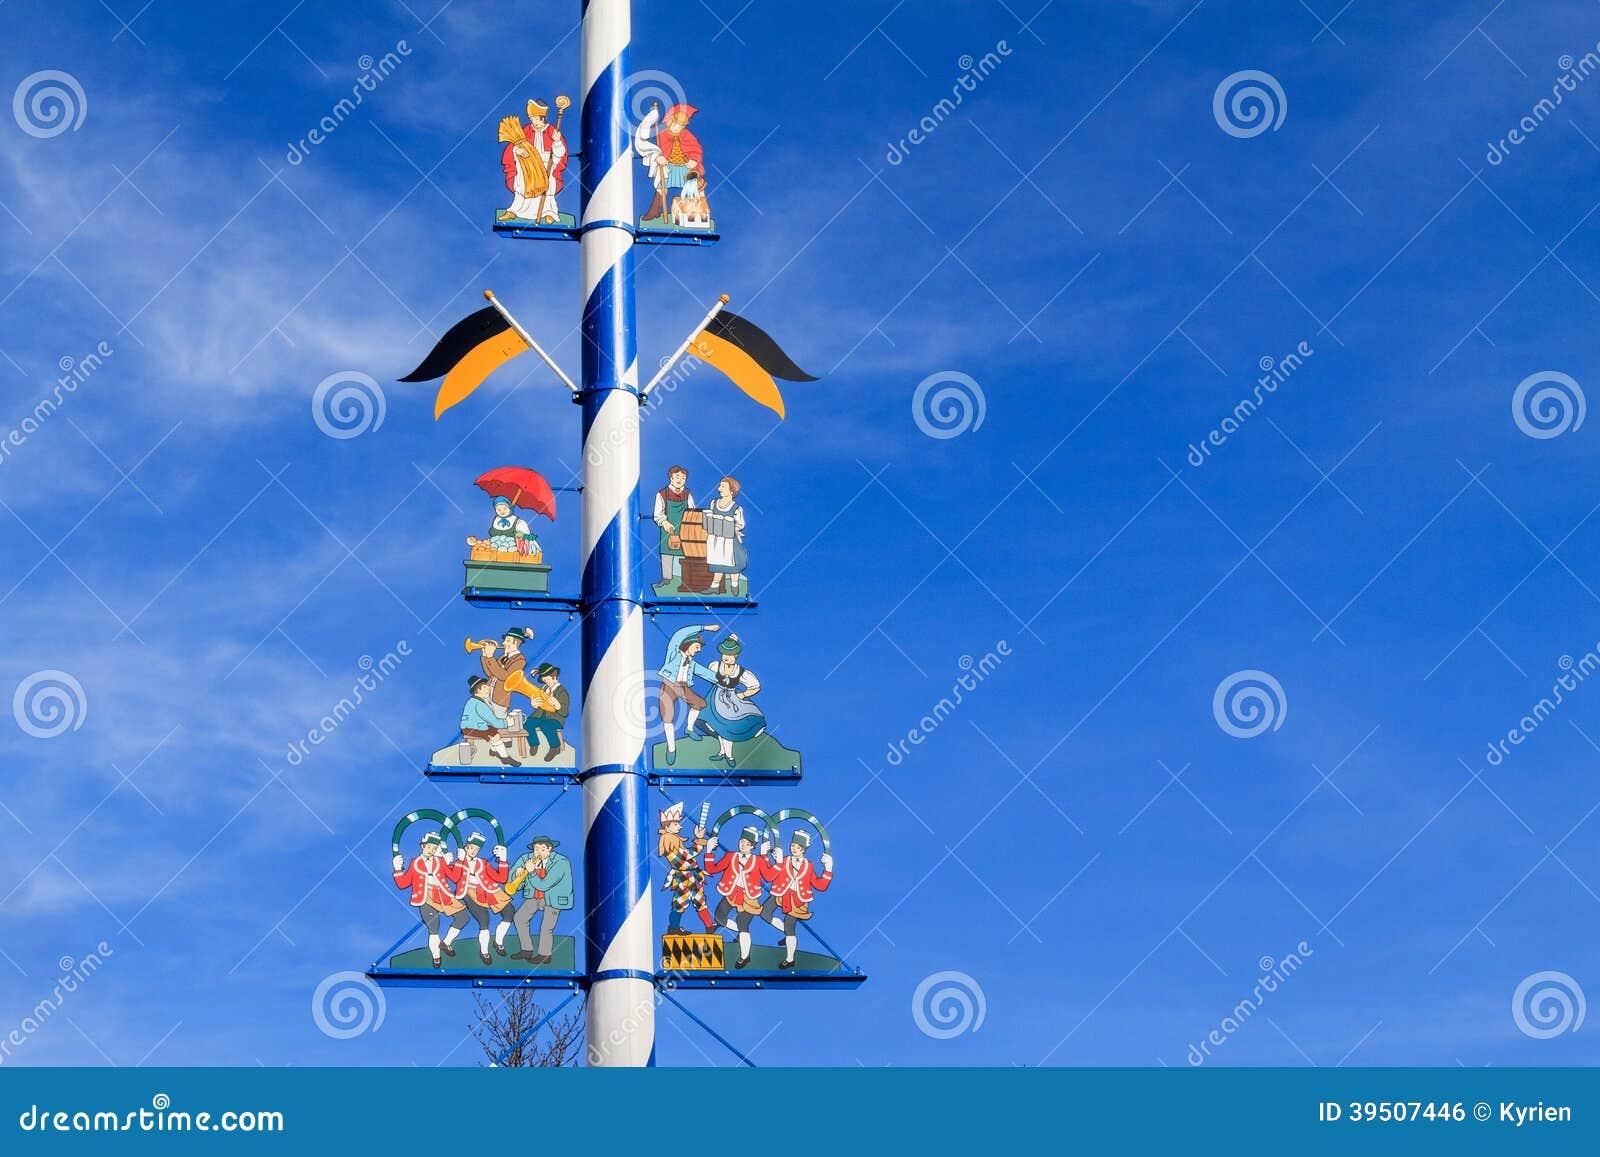 Detail of a Maypole in Munich